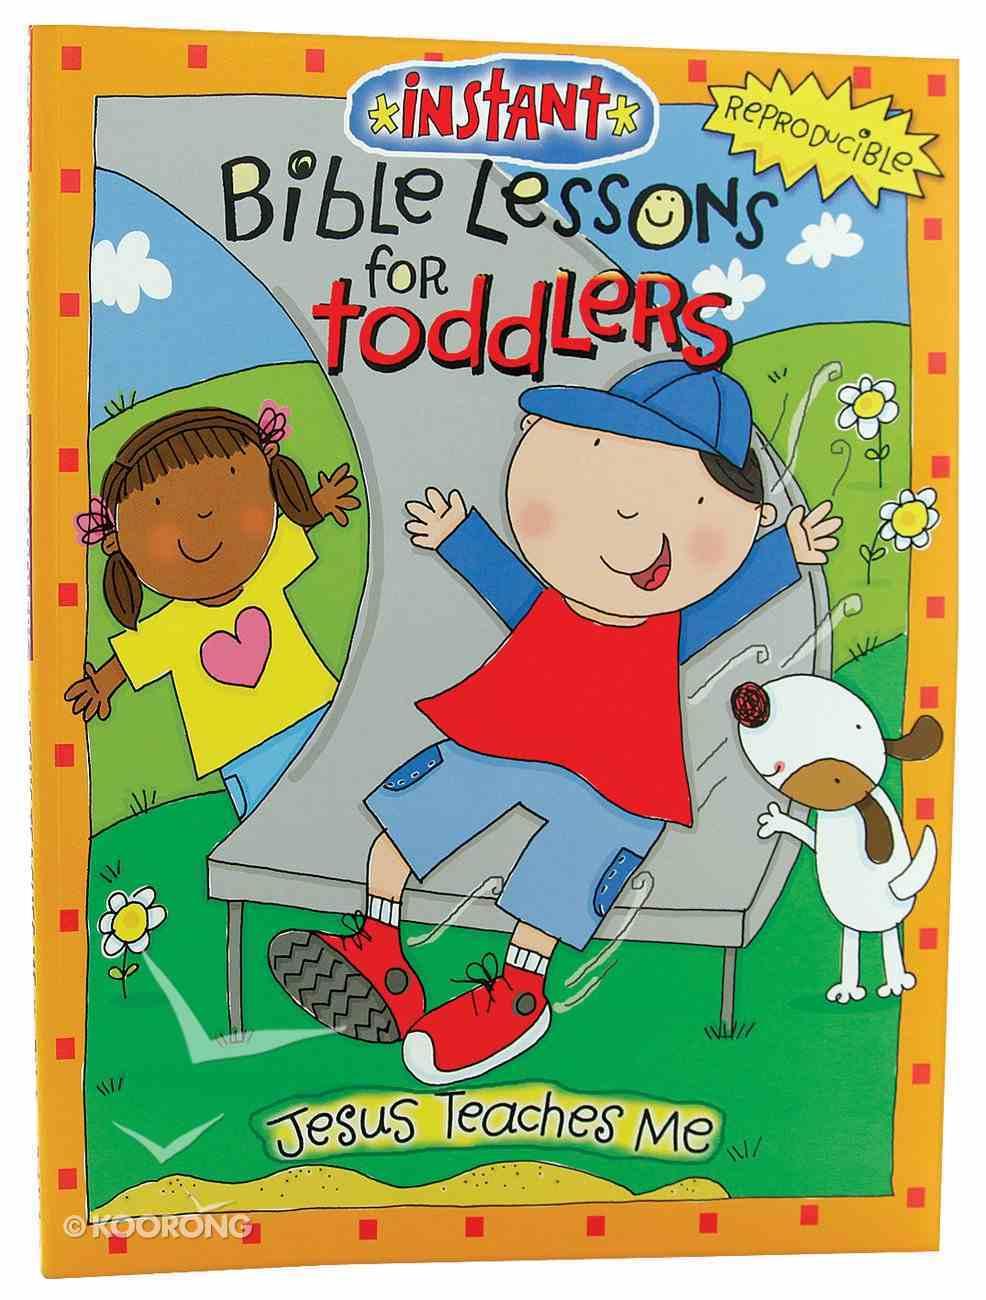 Jesus Teaches Me (Reproducible, Ages 1-3) (Instant Bible Lessons Series) Paperback